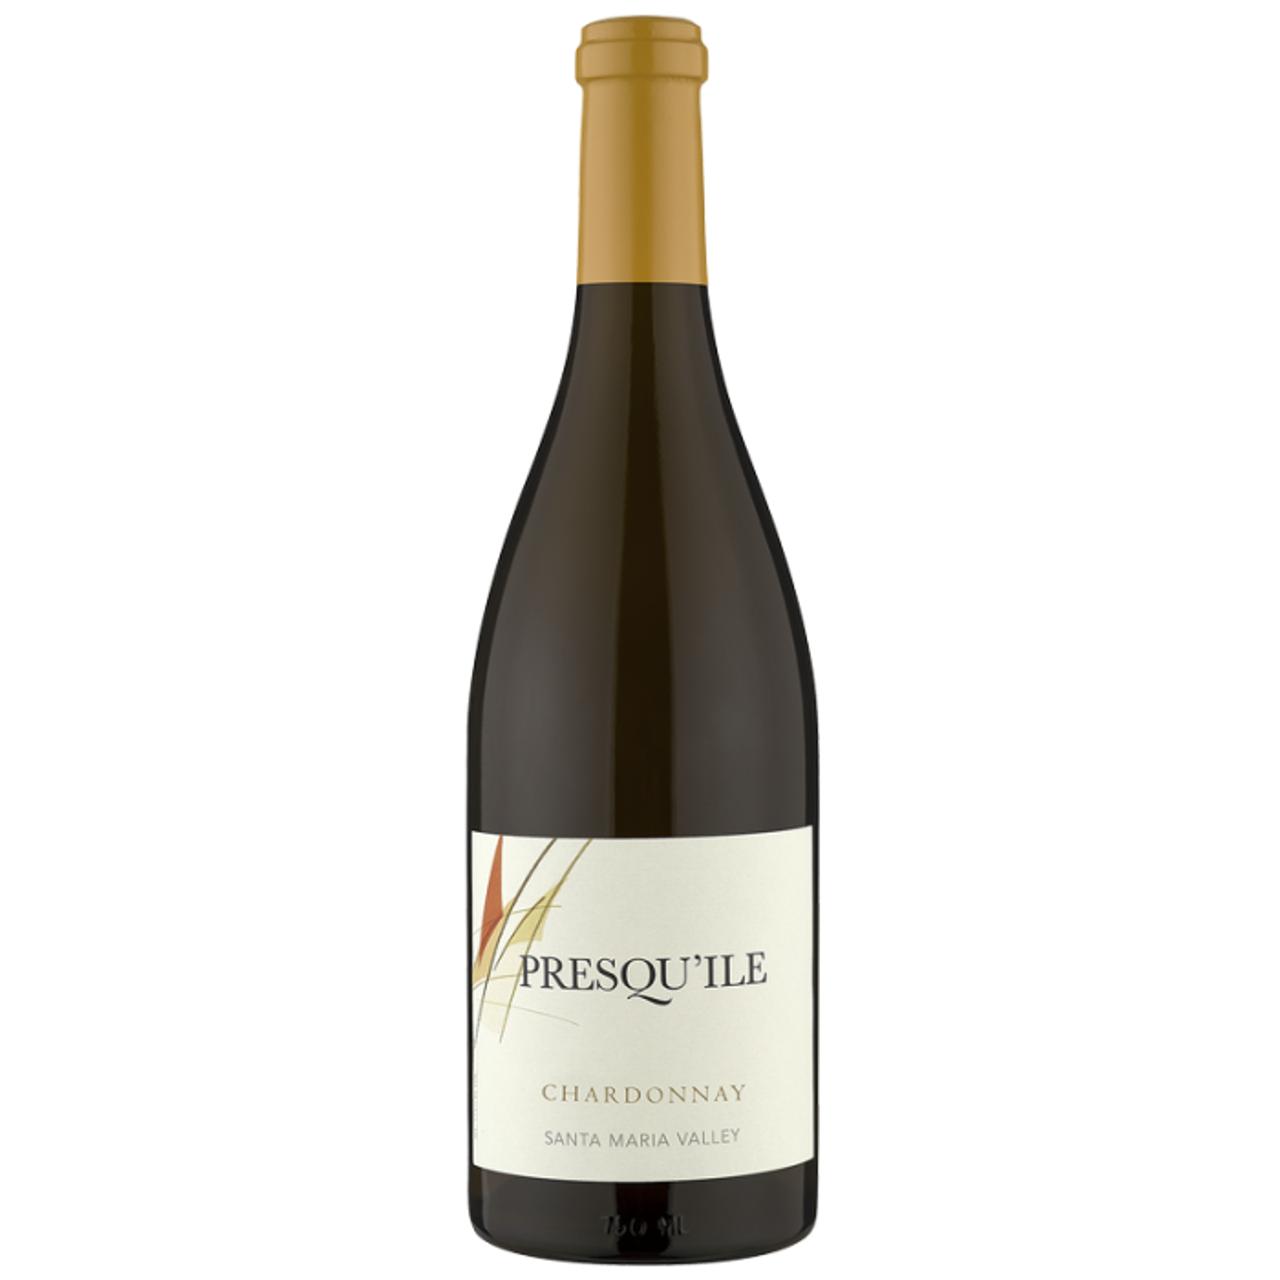 Presqu'ile, Chardonnay Santa Maria Valley 2015